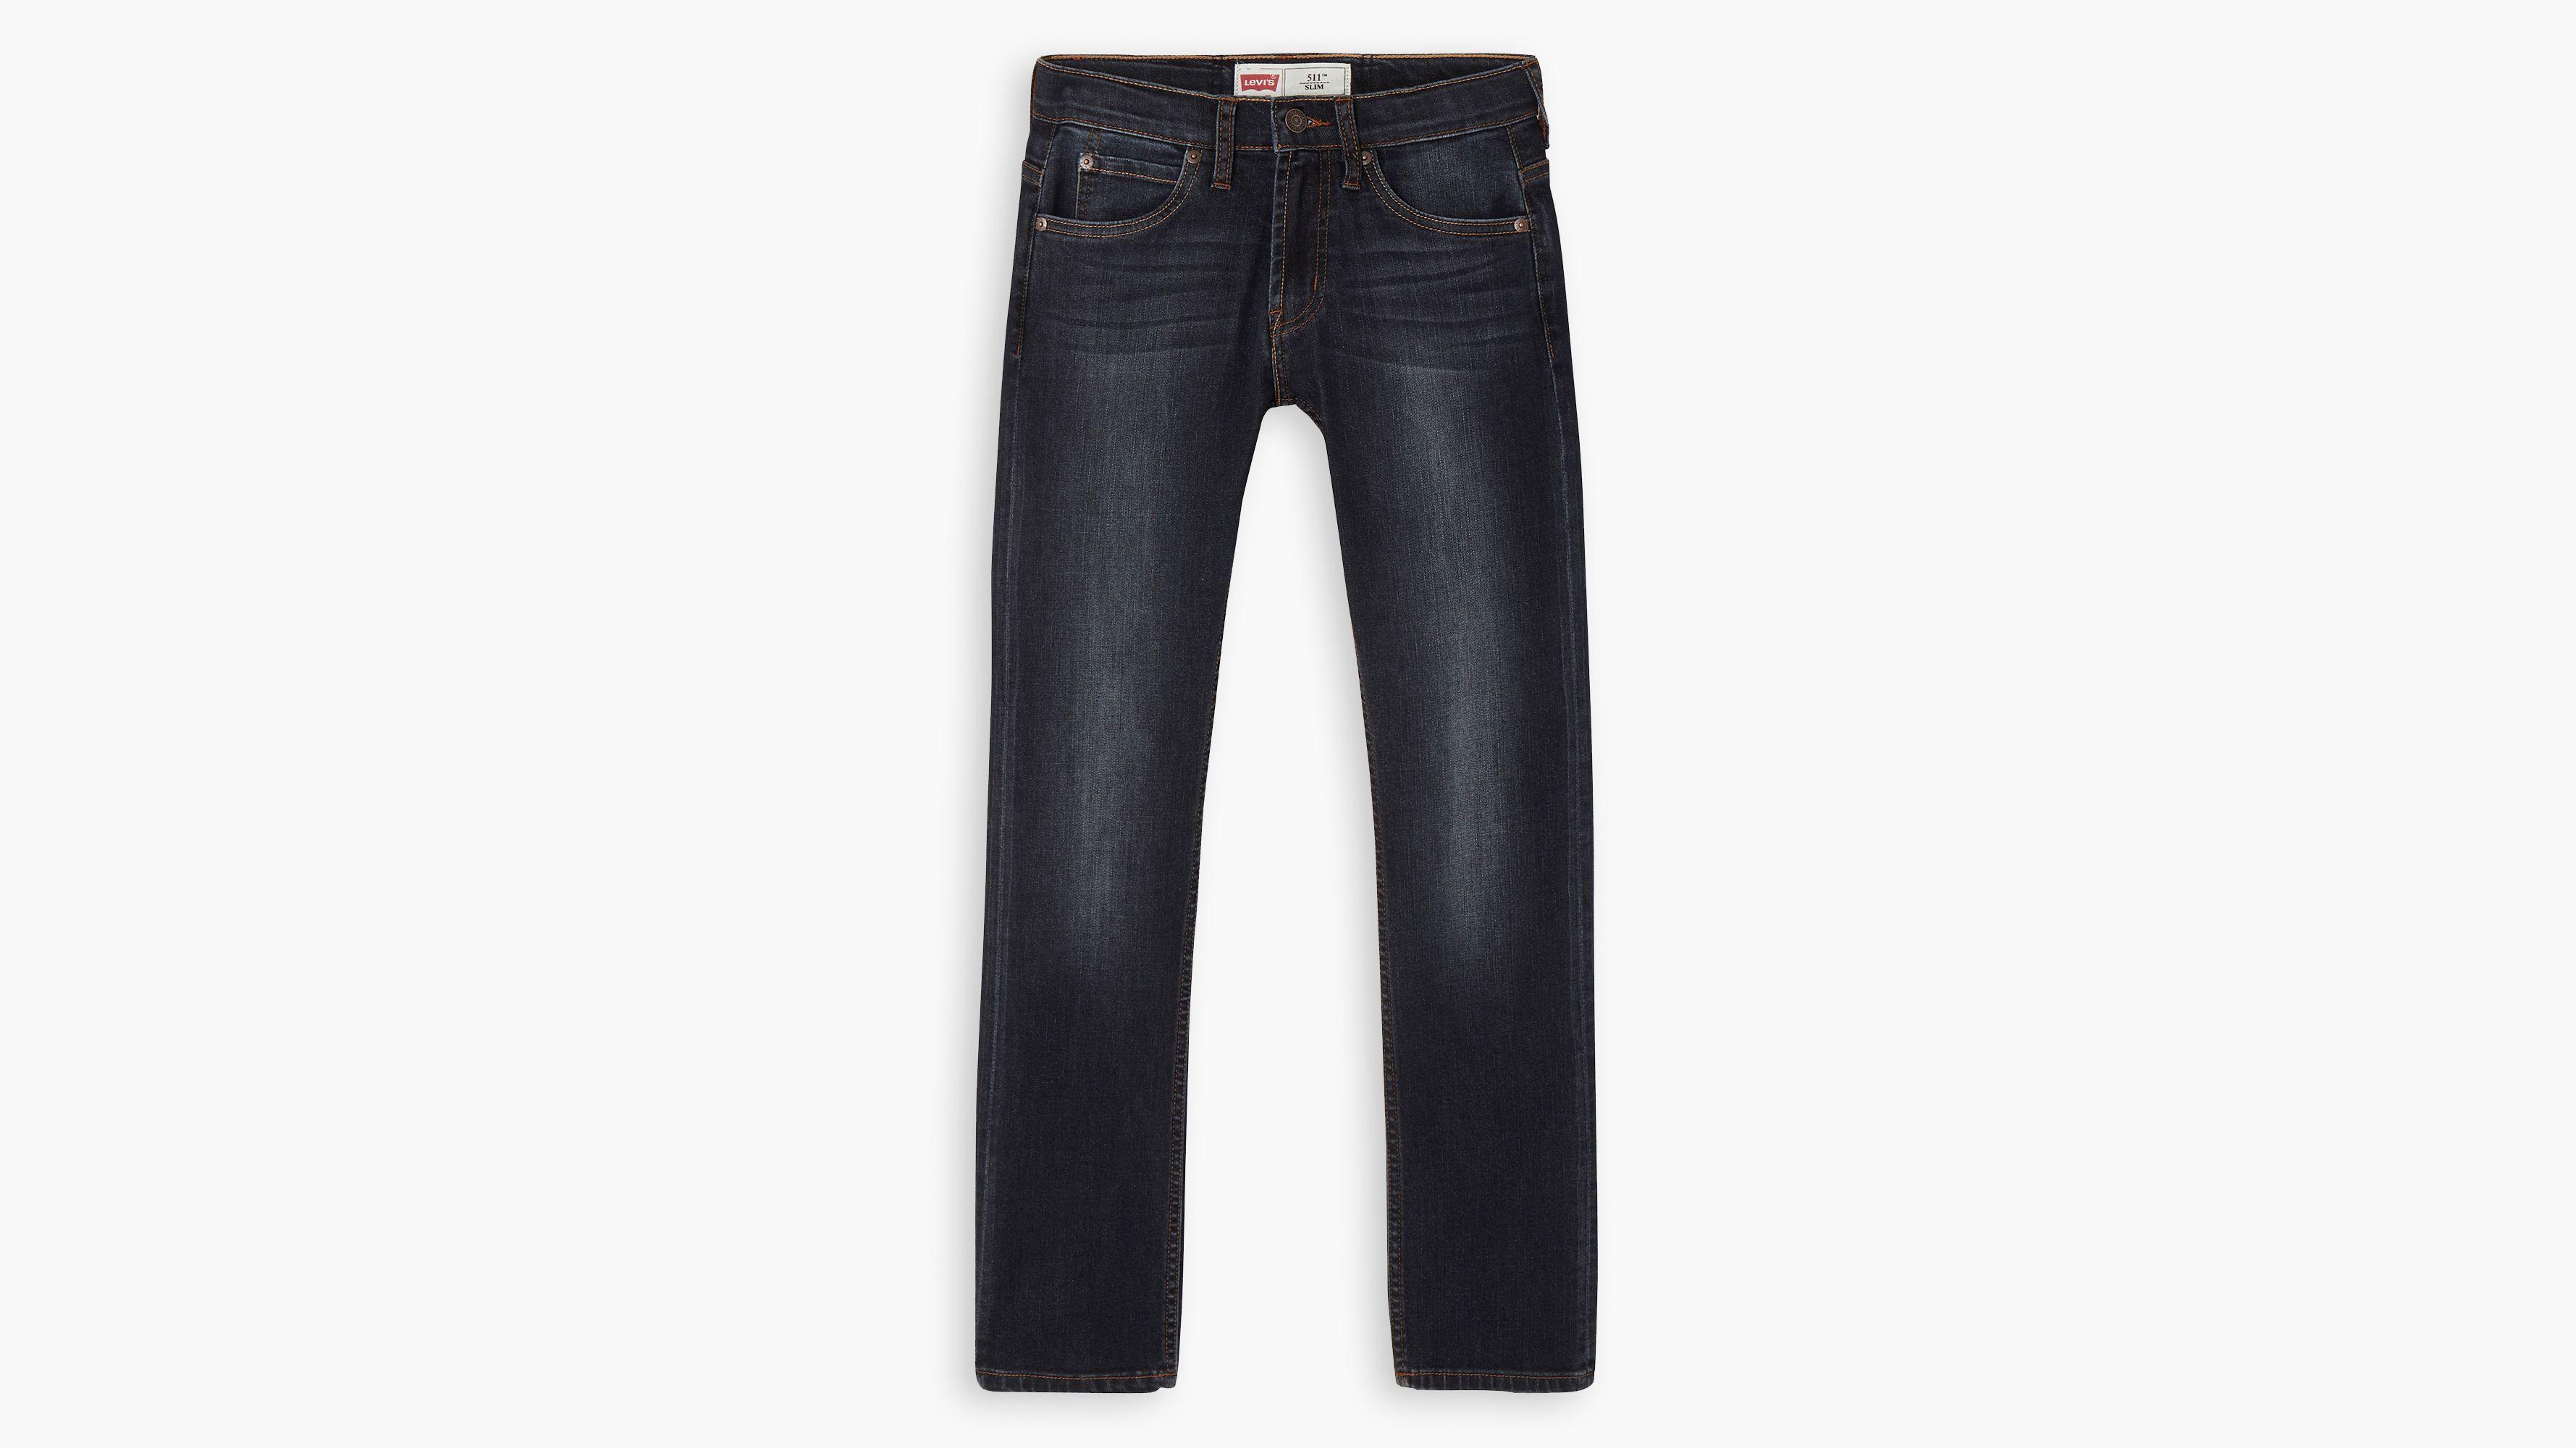 low priced 8817d 240d9 Jeans Pantaloni Bambino It amp  Levi s® 6z67qd